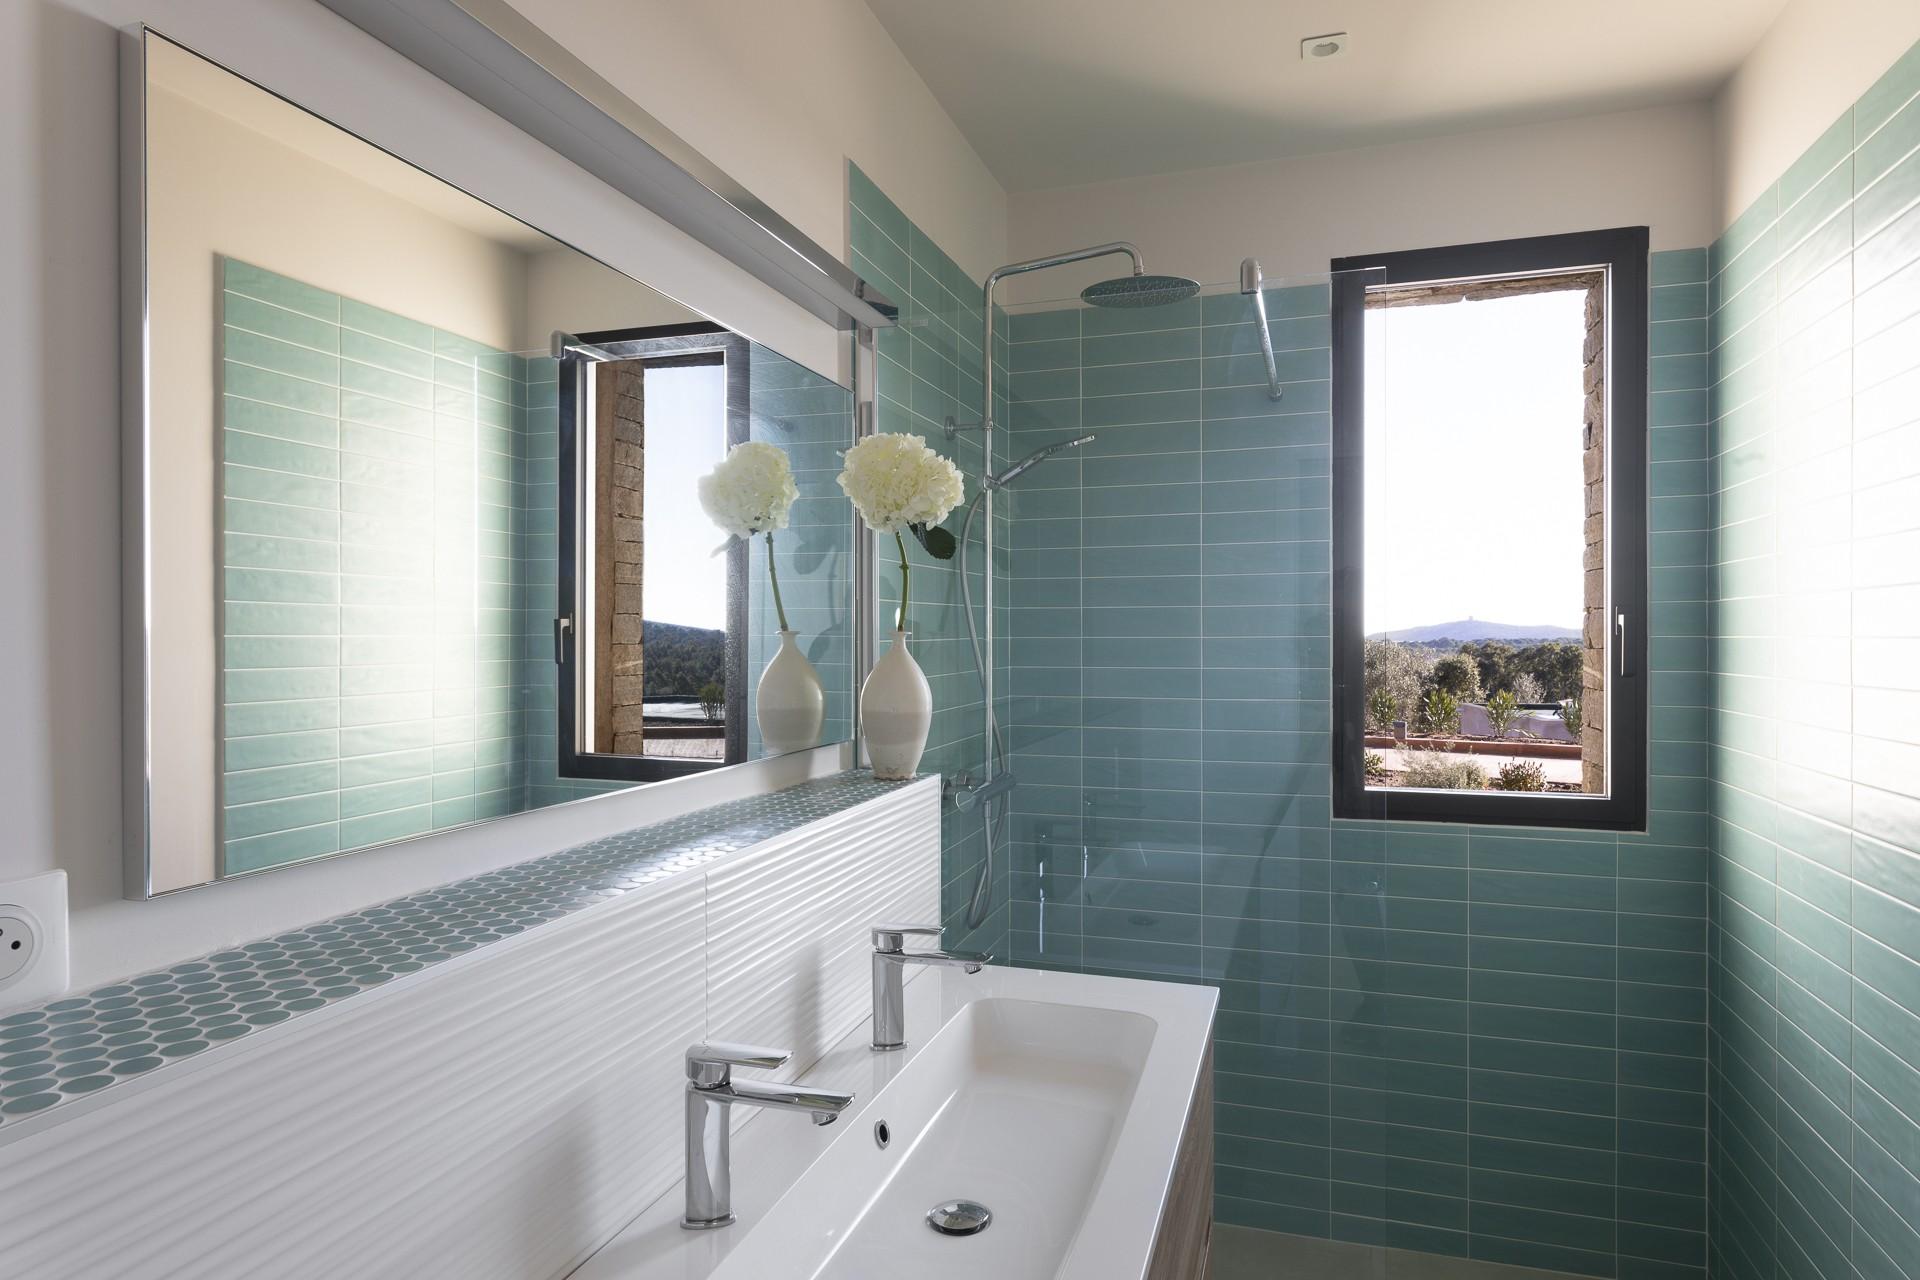 Porto Vecchio Luxury Rental Villa Perle Shower Room